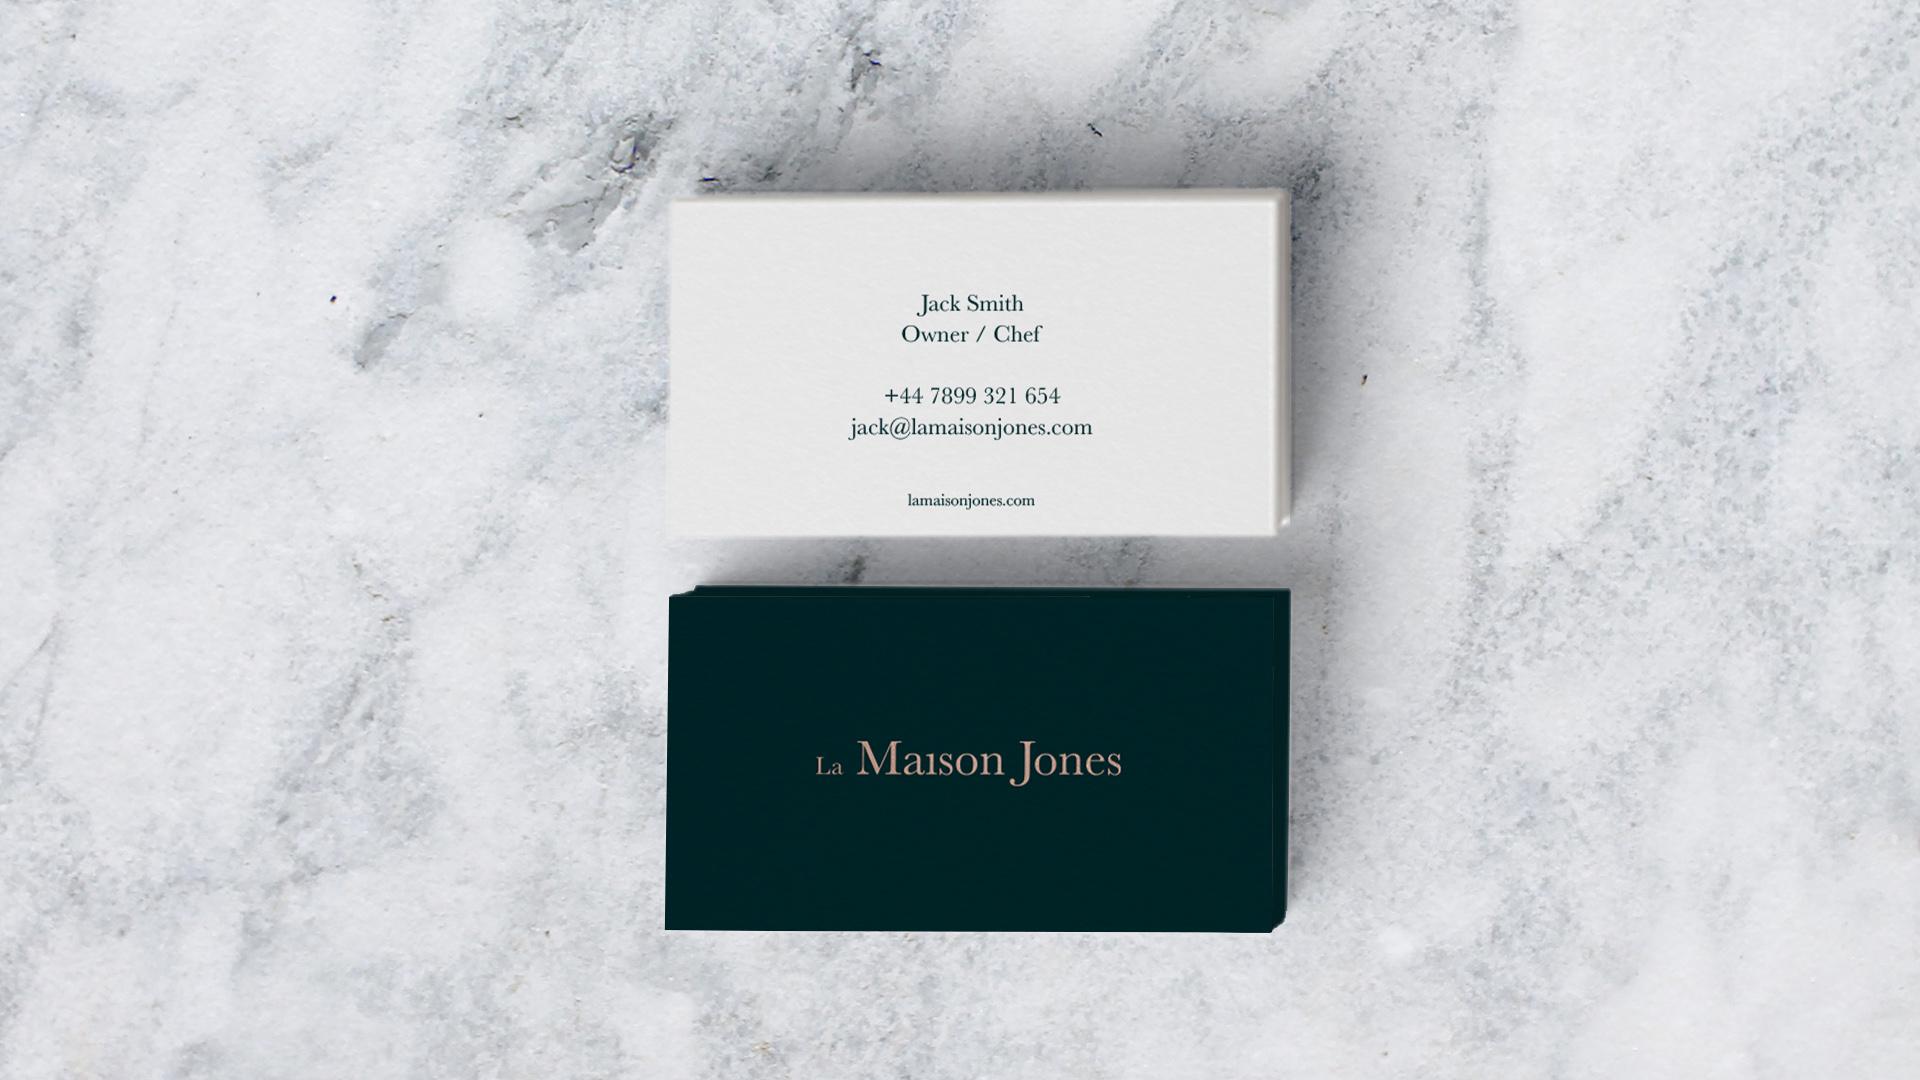 06-Lobo-Creative-La-Maison-Jones-Restaurant-branding-logo-design-case-study.jpg